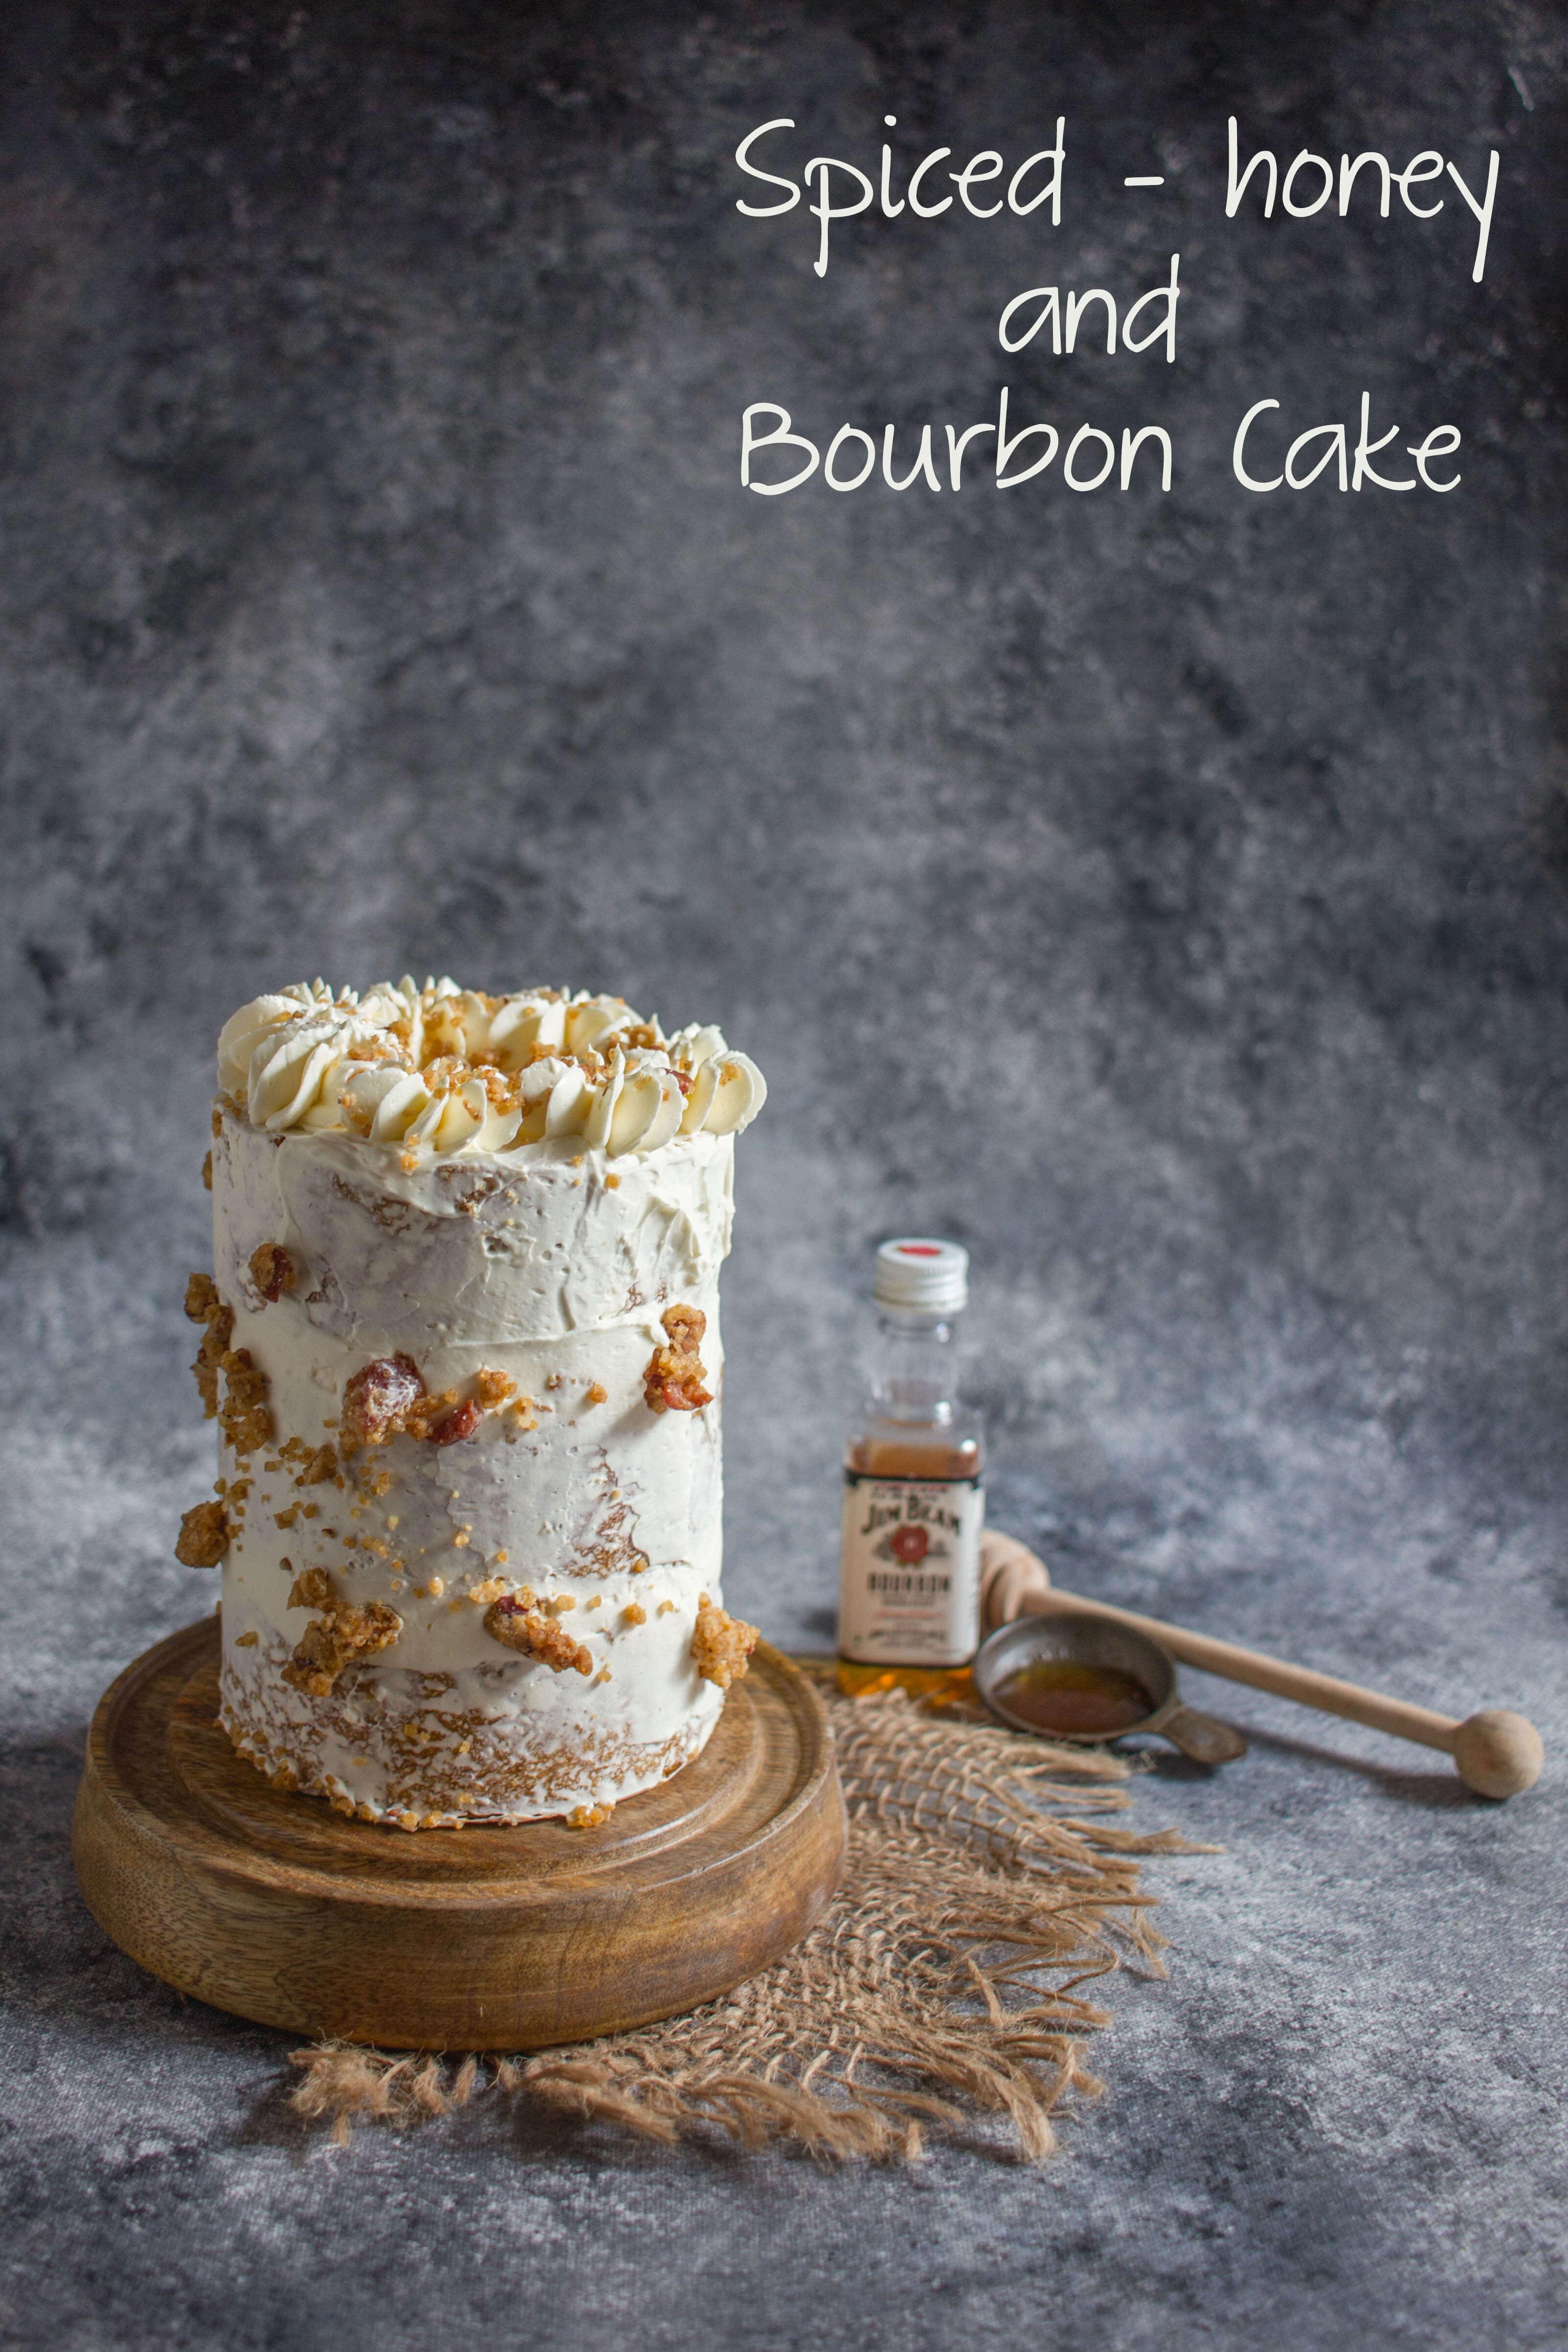 Jasons Birthday Cake 2017 Spiced Honey And Bourbon Cake Lil